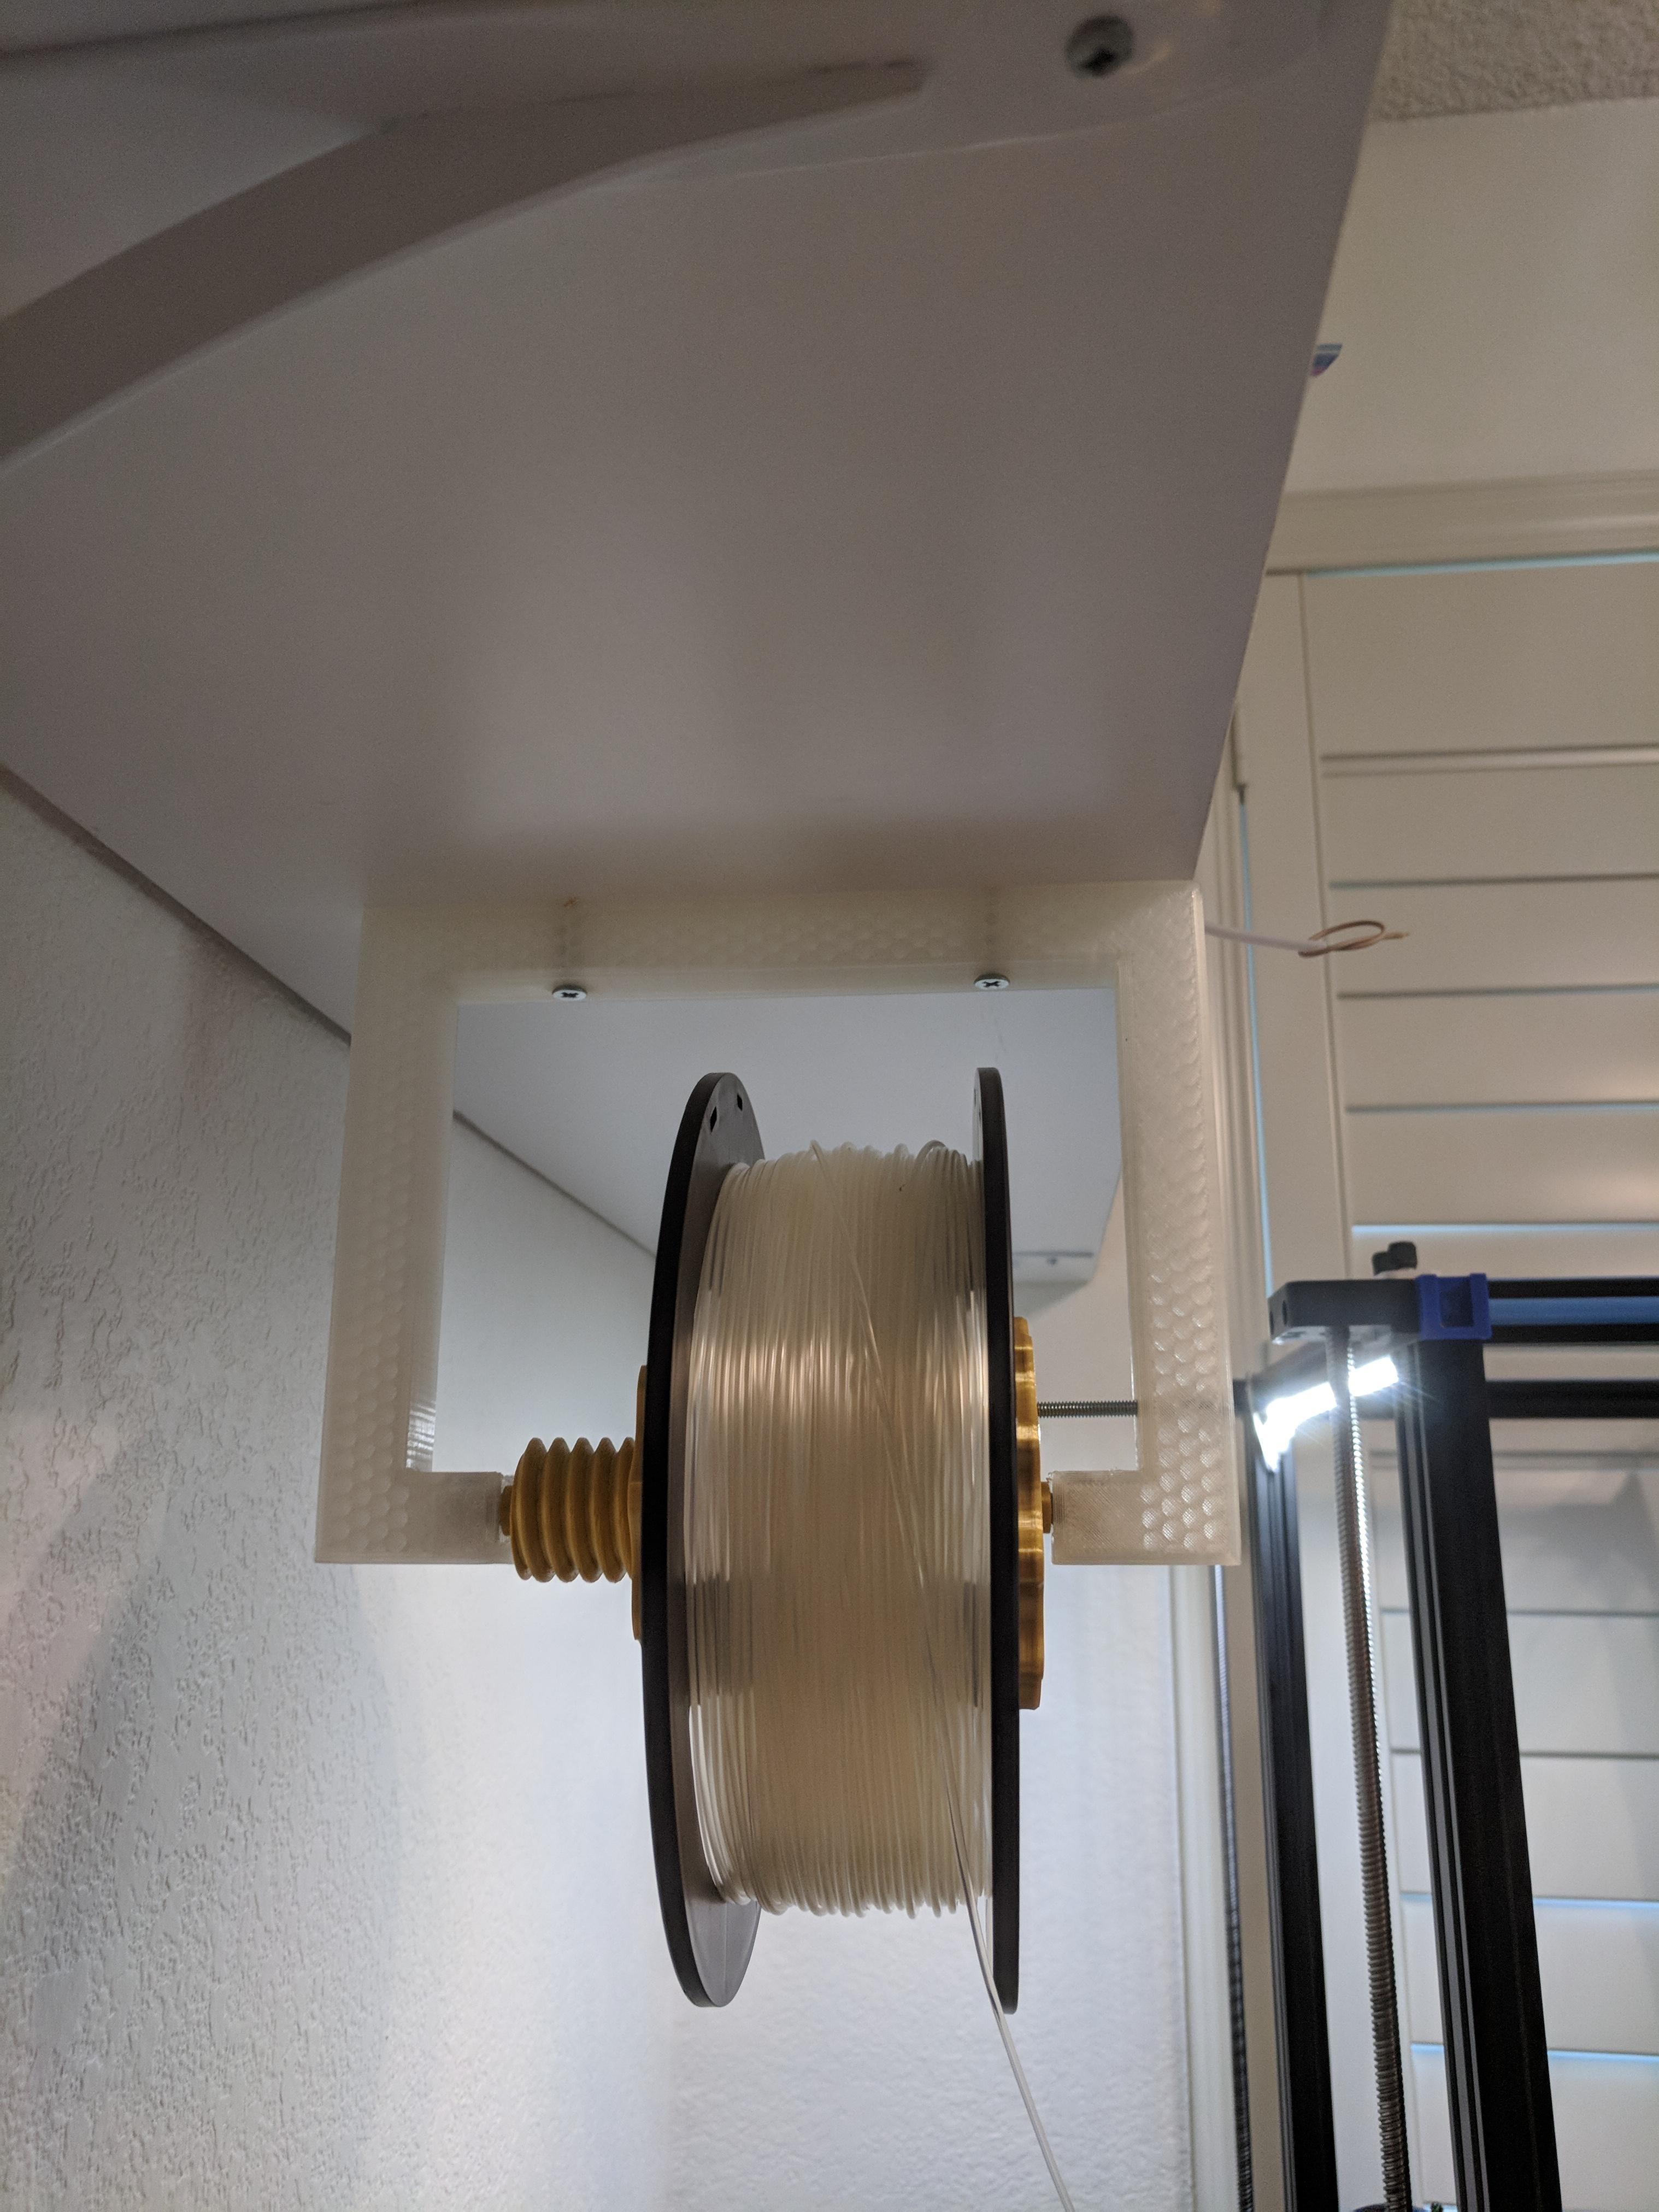 IMG_20180728_125450.jpg Download free STL file Suspended Filament Spool Holder • 3D printing model, ibgeek